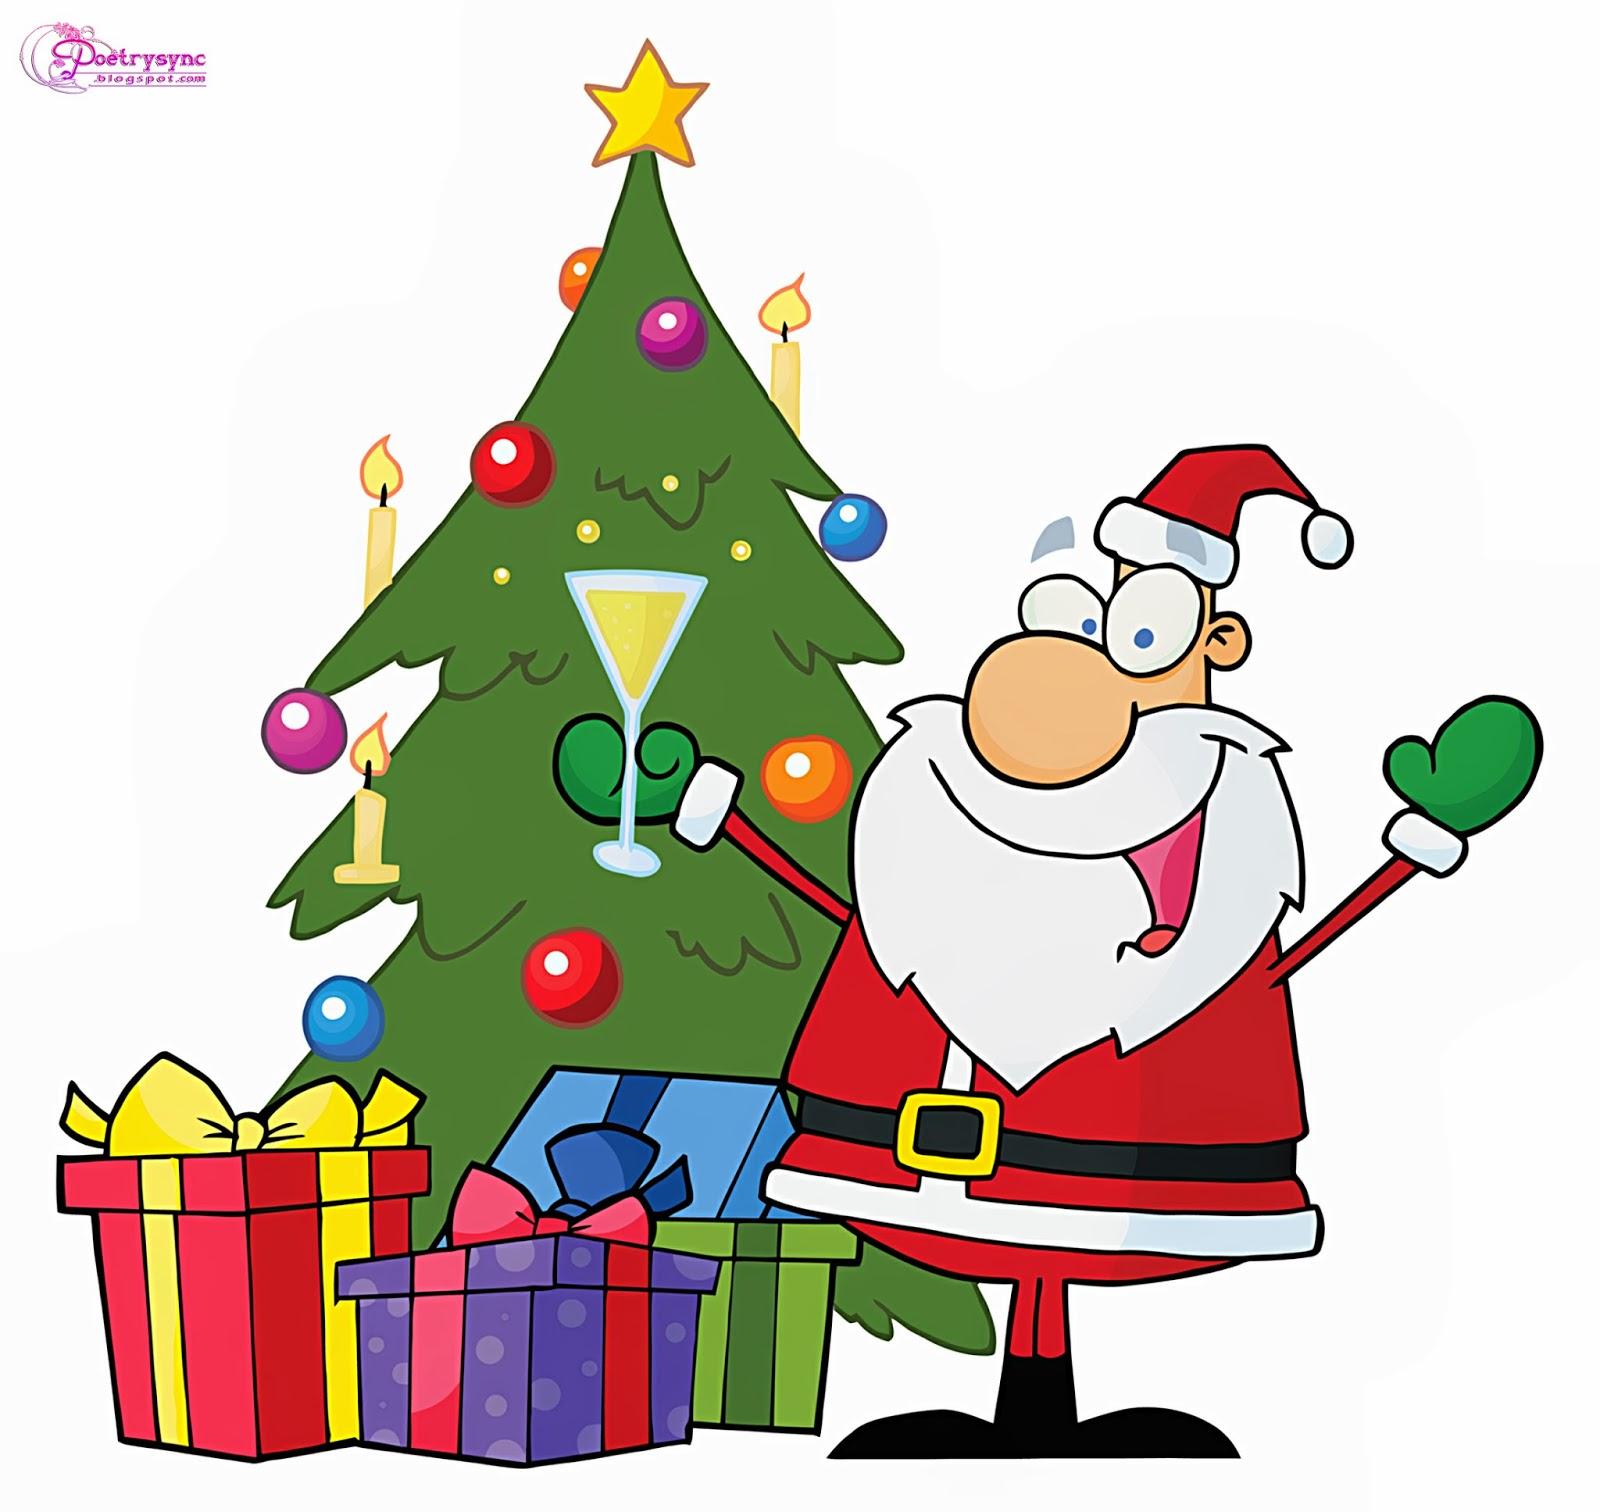 Cliparts fest kostenlos clip freeuse Christmas fest clipart - ClipartFest clip freeuse